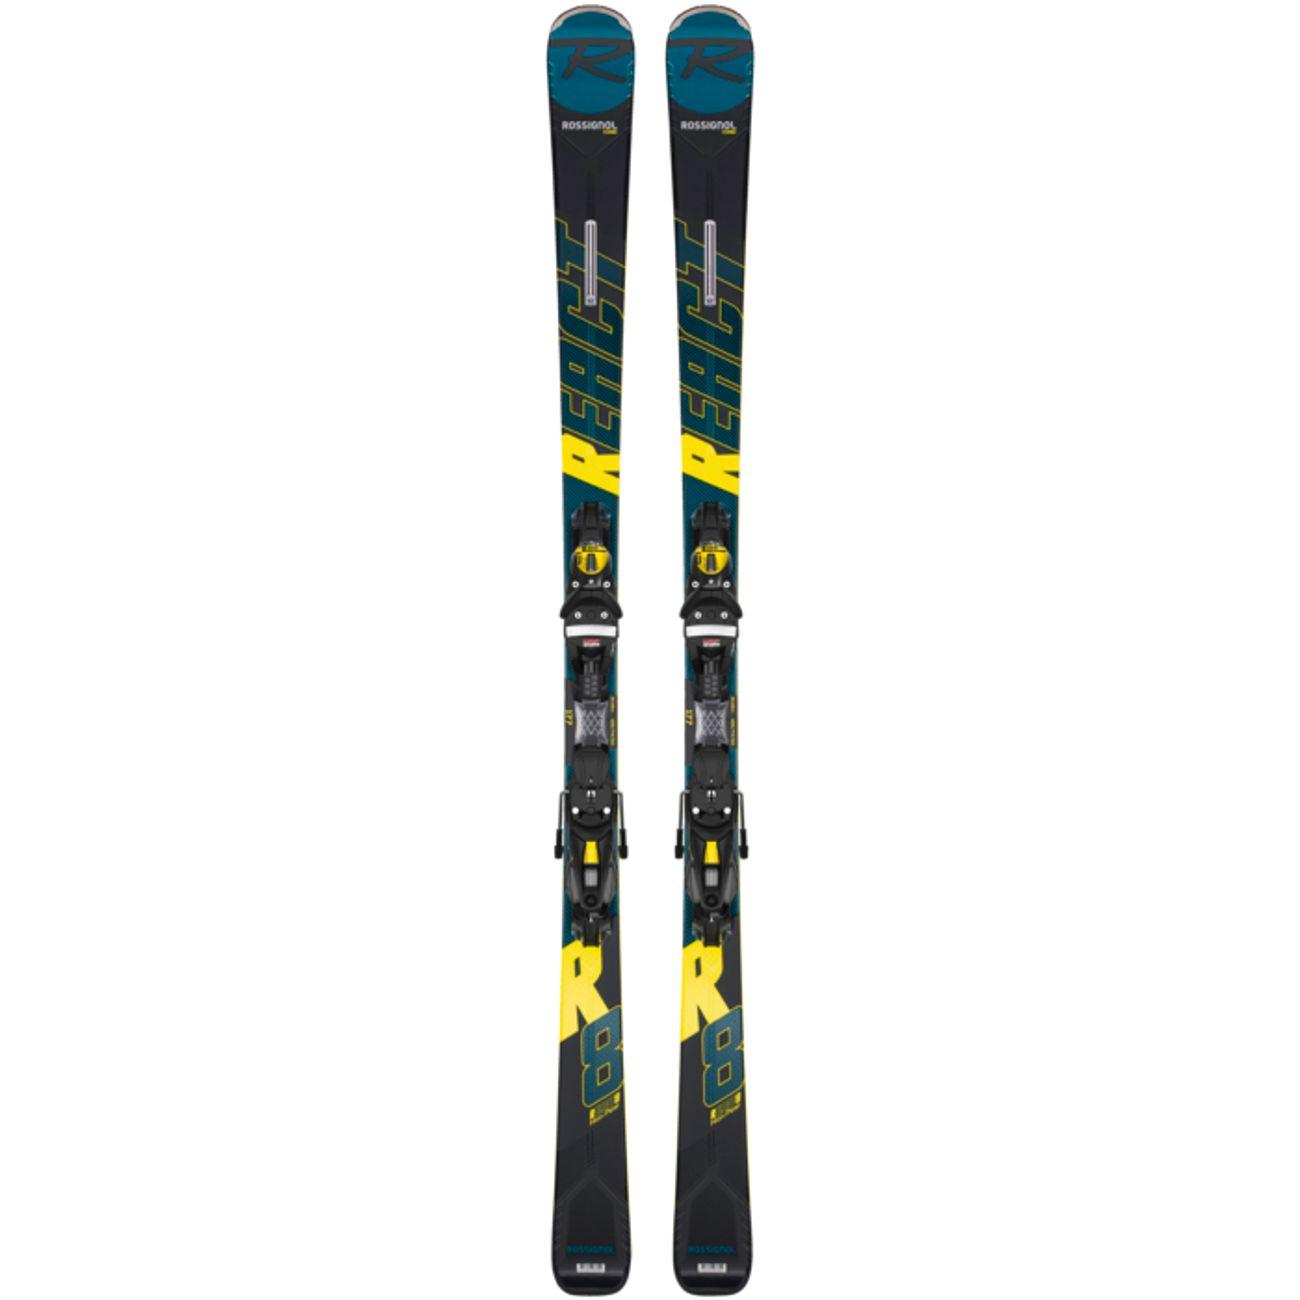 SKIS Ski adulte ROSSIGNOL REACT R8 HP/NX12 K.GW